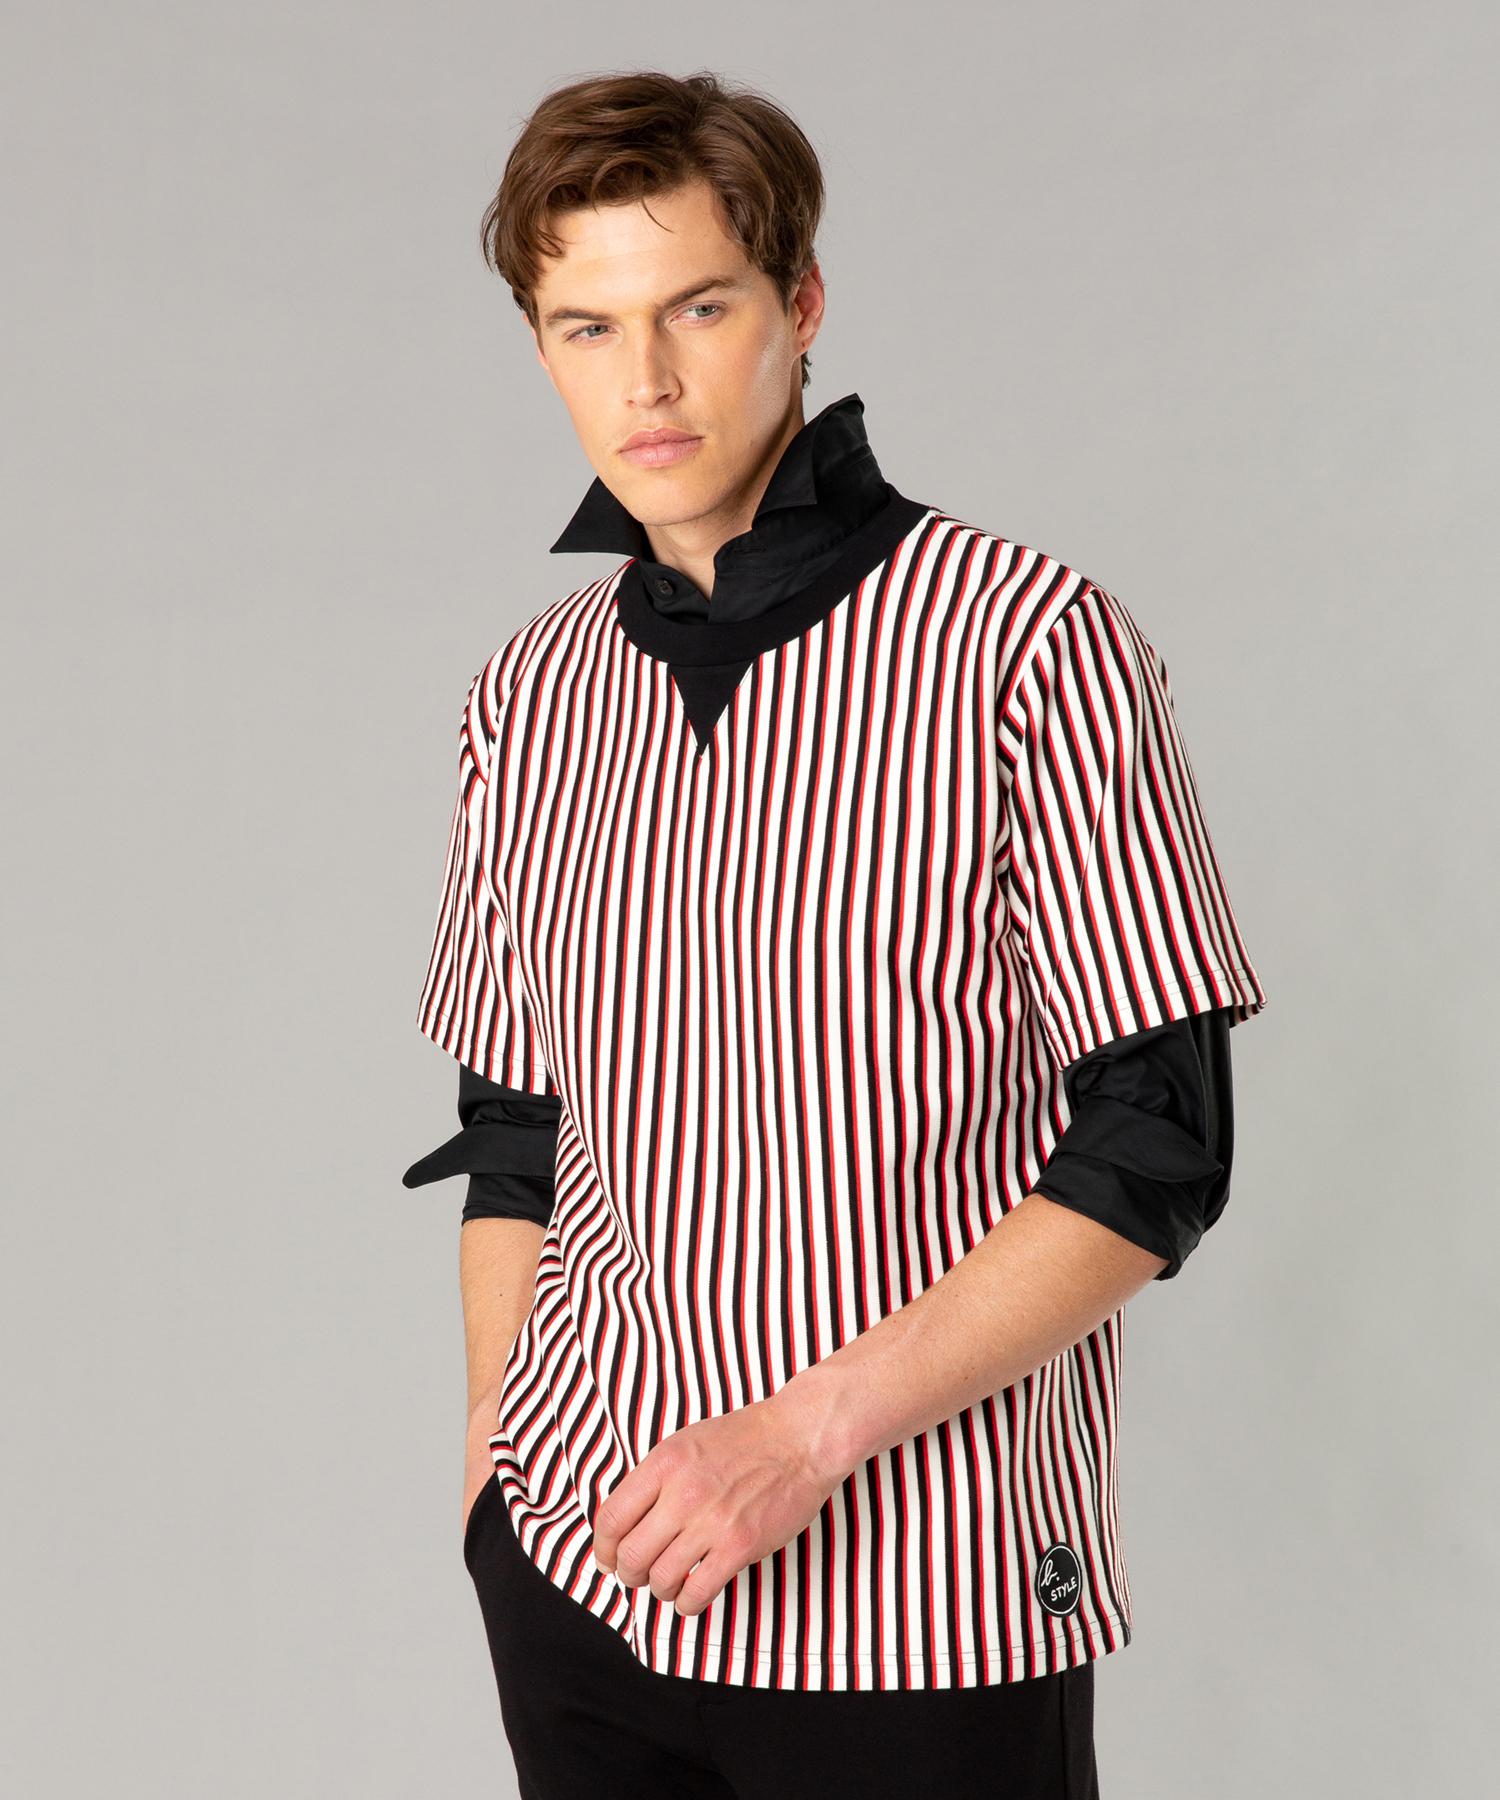 JDI5 TS ストライプTシャツ